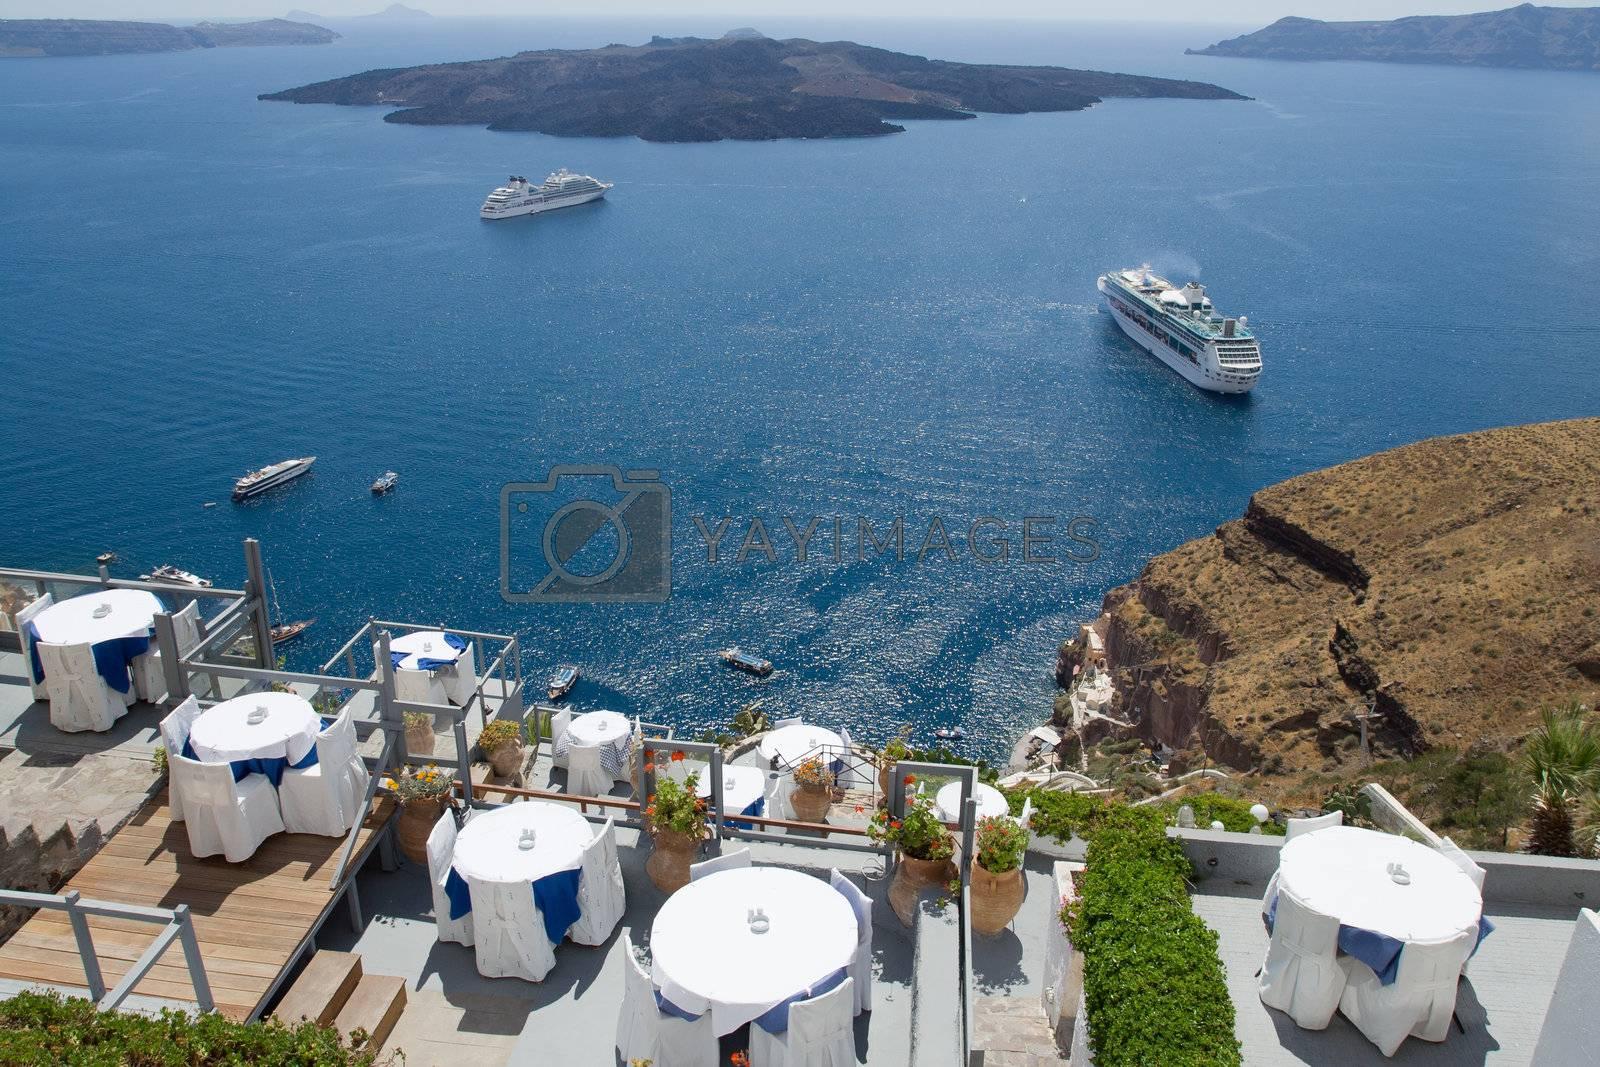 Seascape on volcanic caldera as seen from the restaurants' terrace along cliffs in Fira, Santorini island capital, Greece